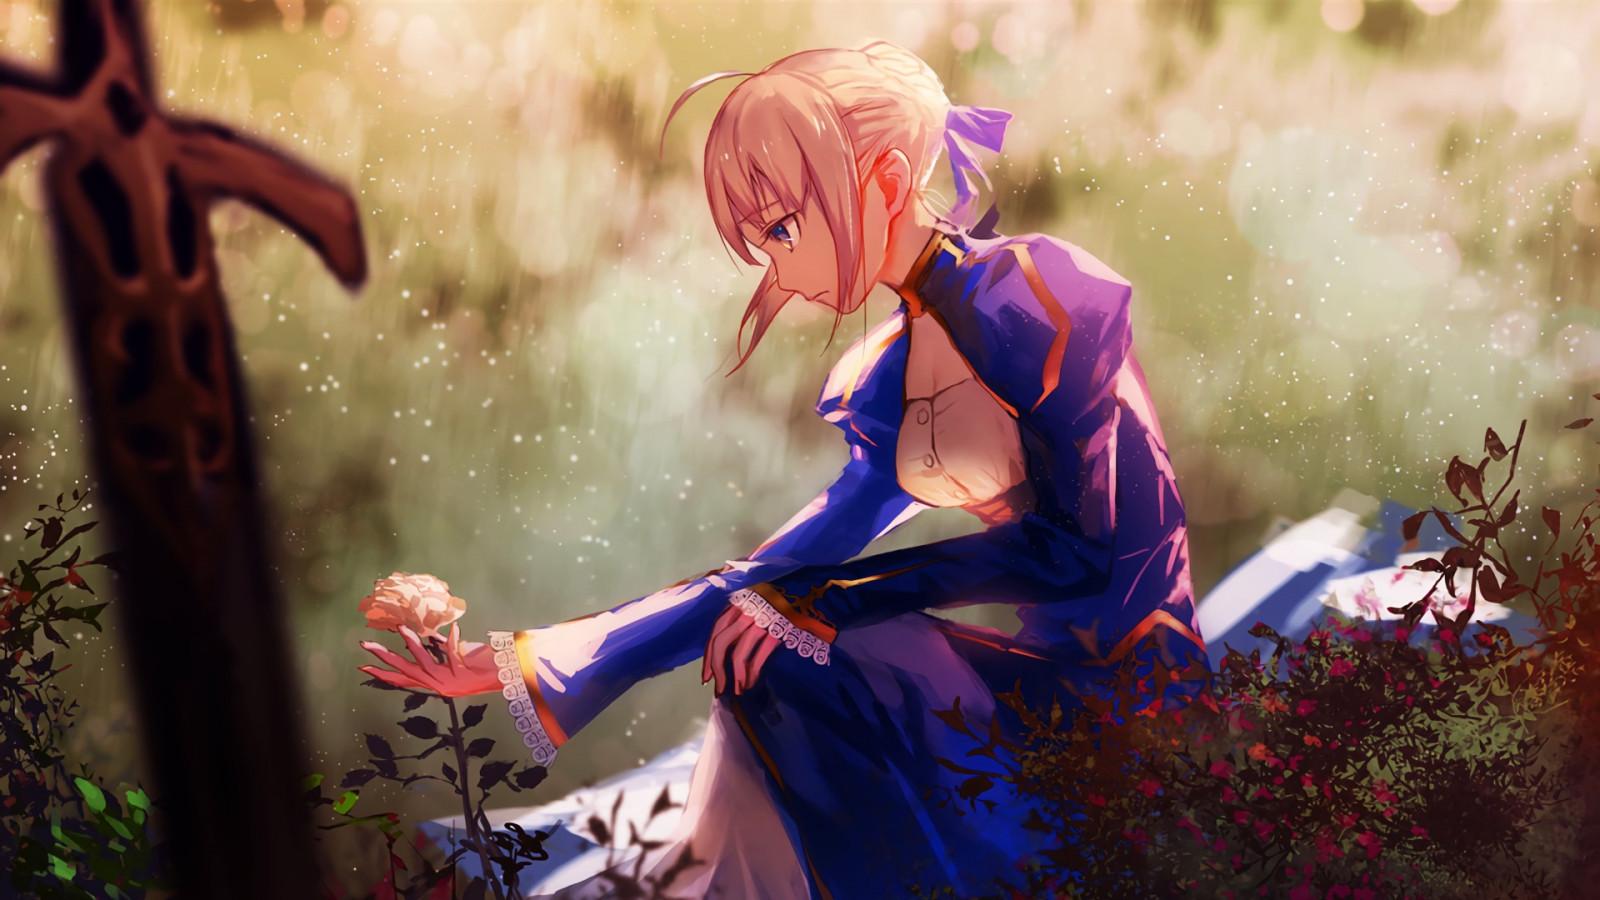 1920x1080 px anime Anime Girls Fate Series Saber Tohsaka